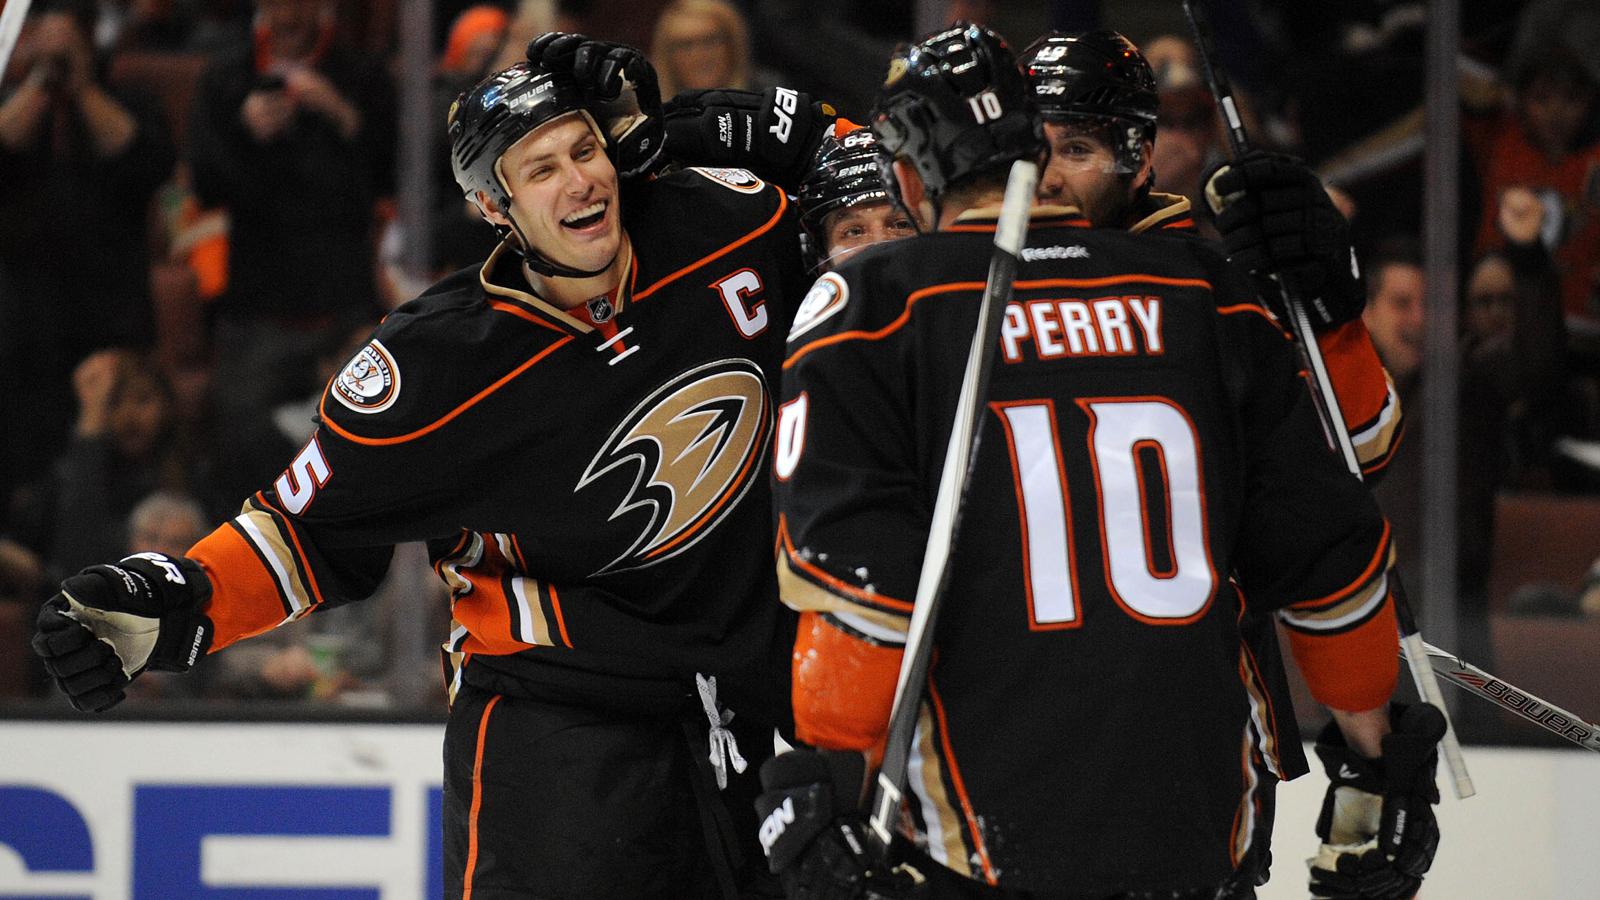 Penguins continue Stanley Cup defense vs. Ducks